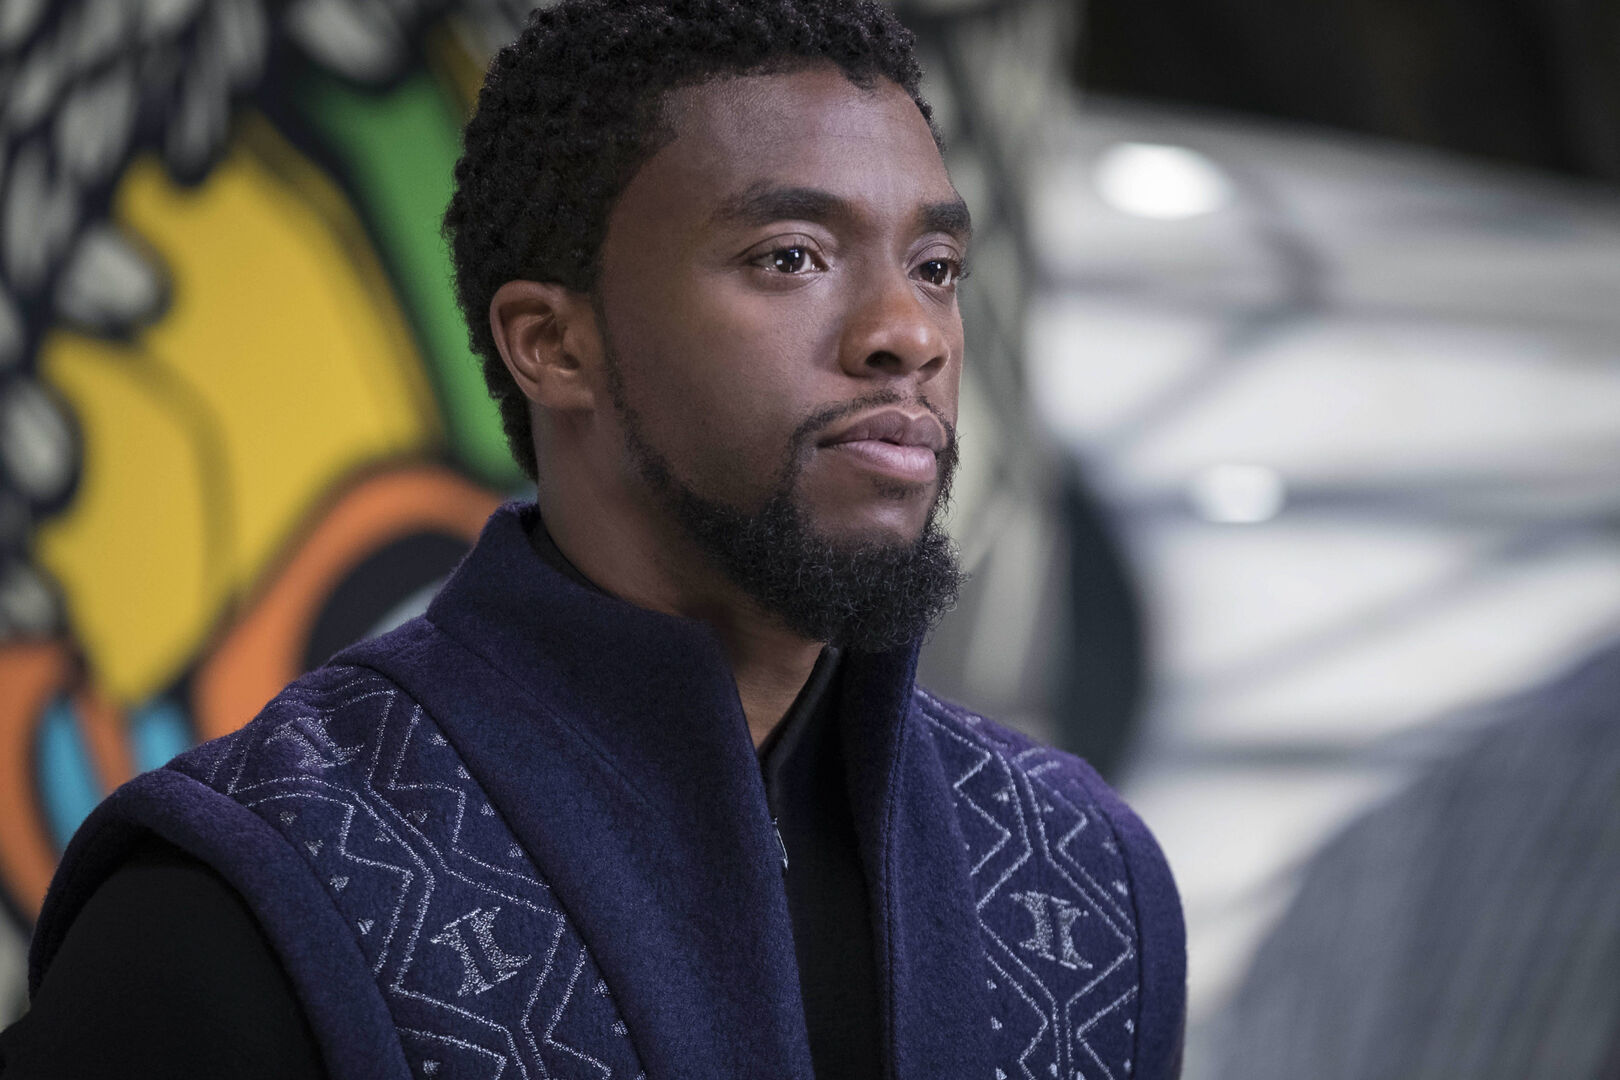 Muere Chadwick Boseman, protagonista de 'Black Panther'